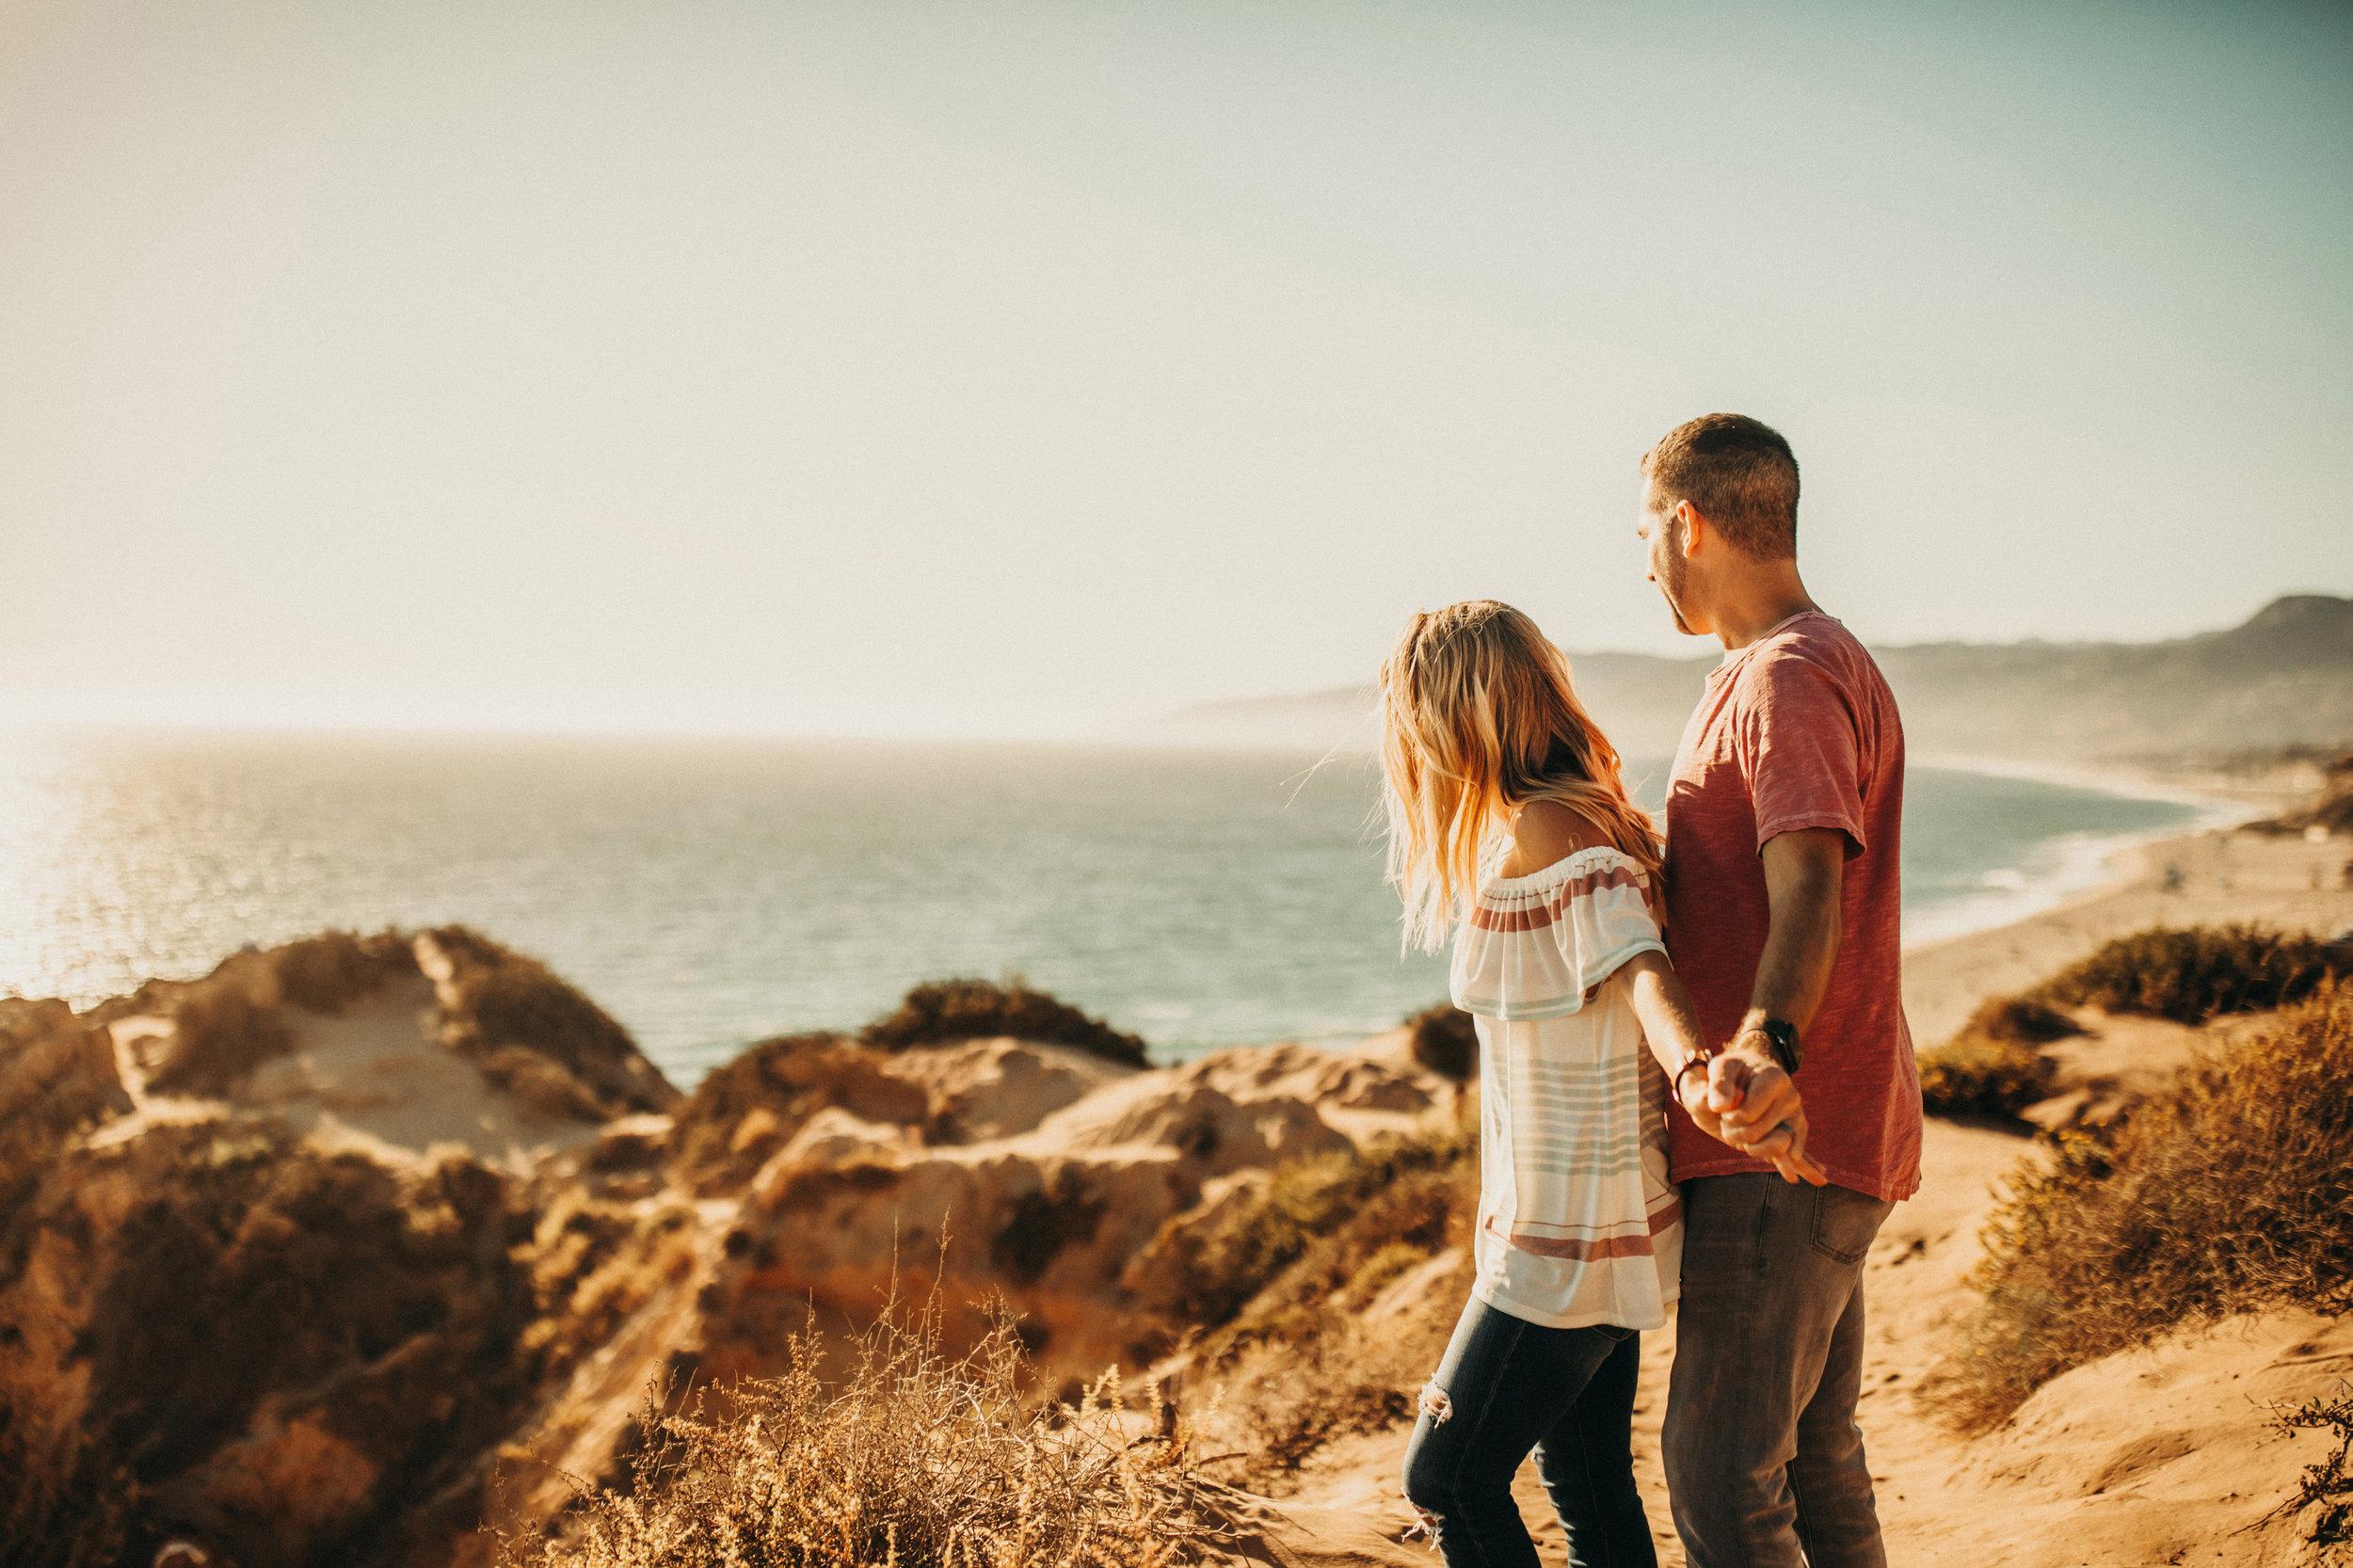 point-dume-anniversary-shoot-malibu-california-lifestyle